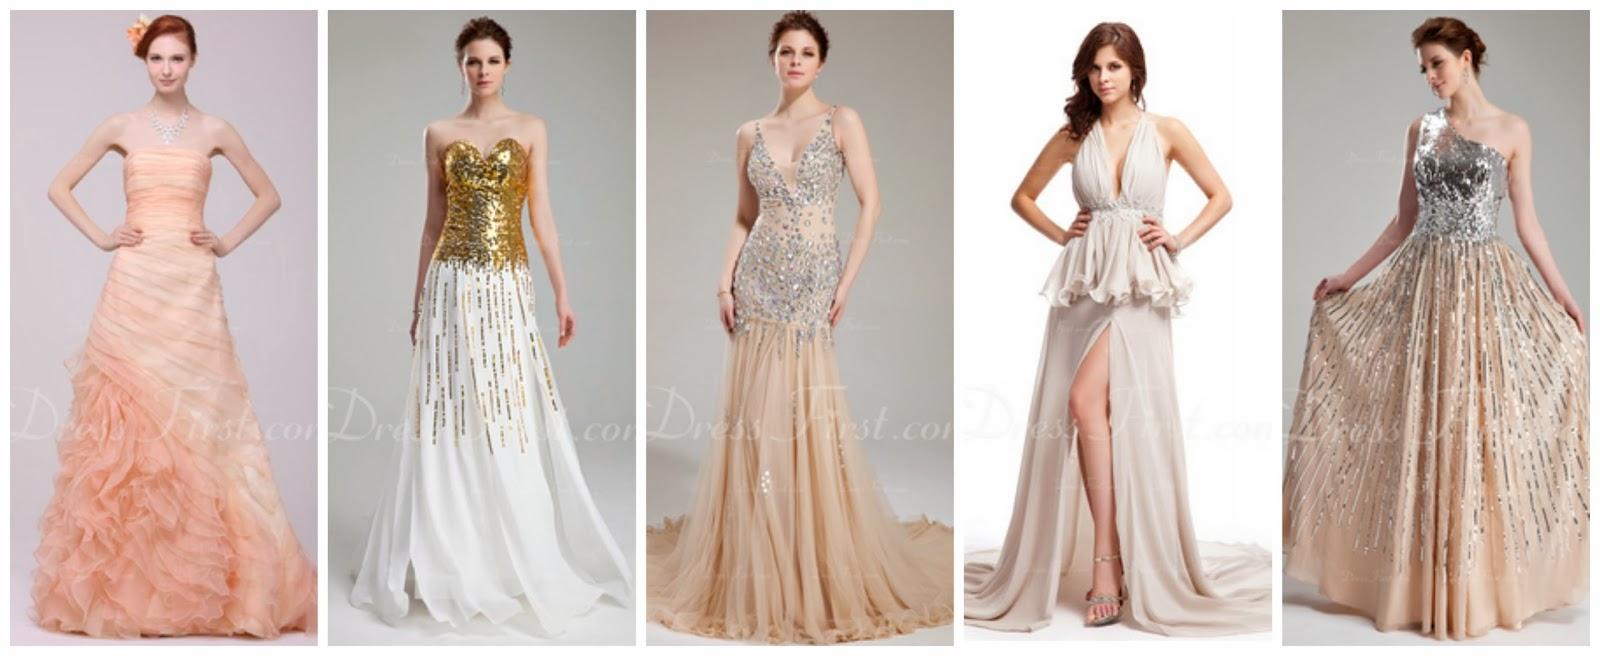 2014 red prom dresses 2014 black prom dresses 2014 prom dresses    Vintage Inspired Prom Dresses 2014